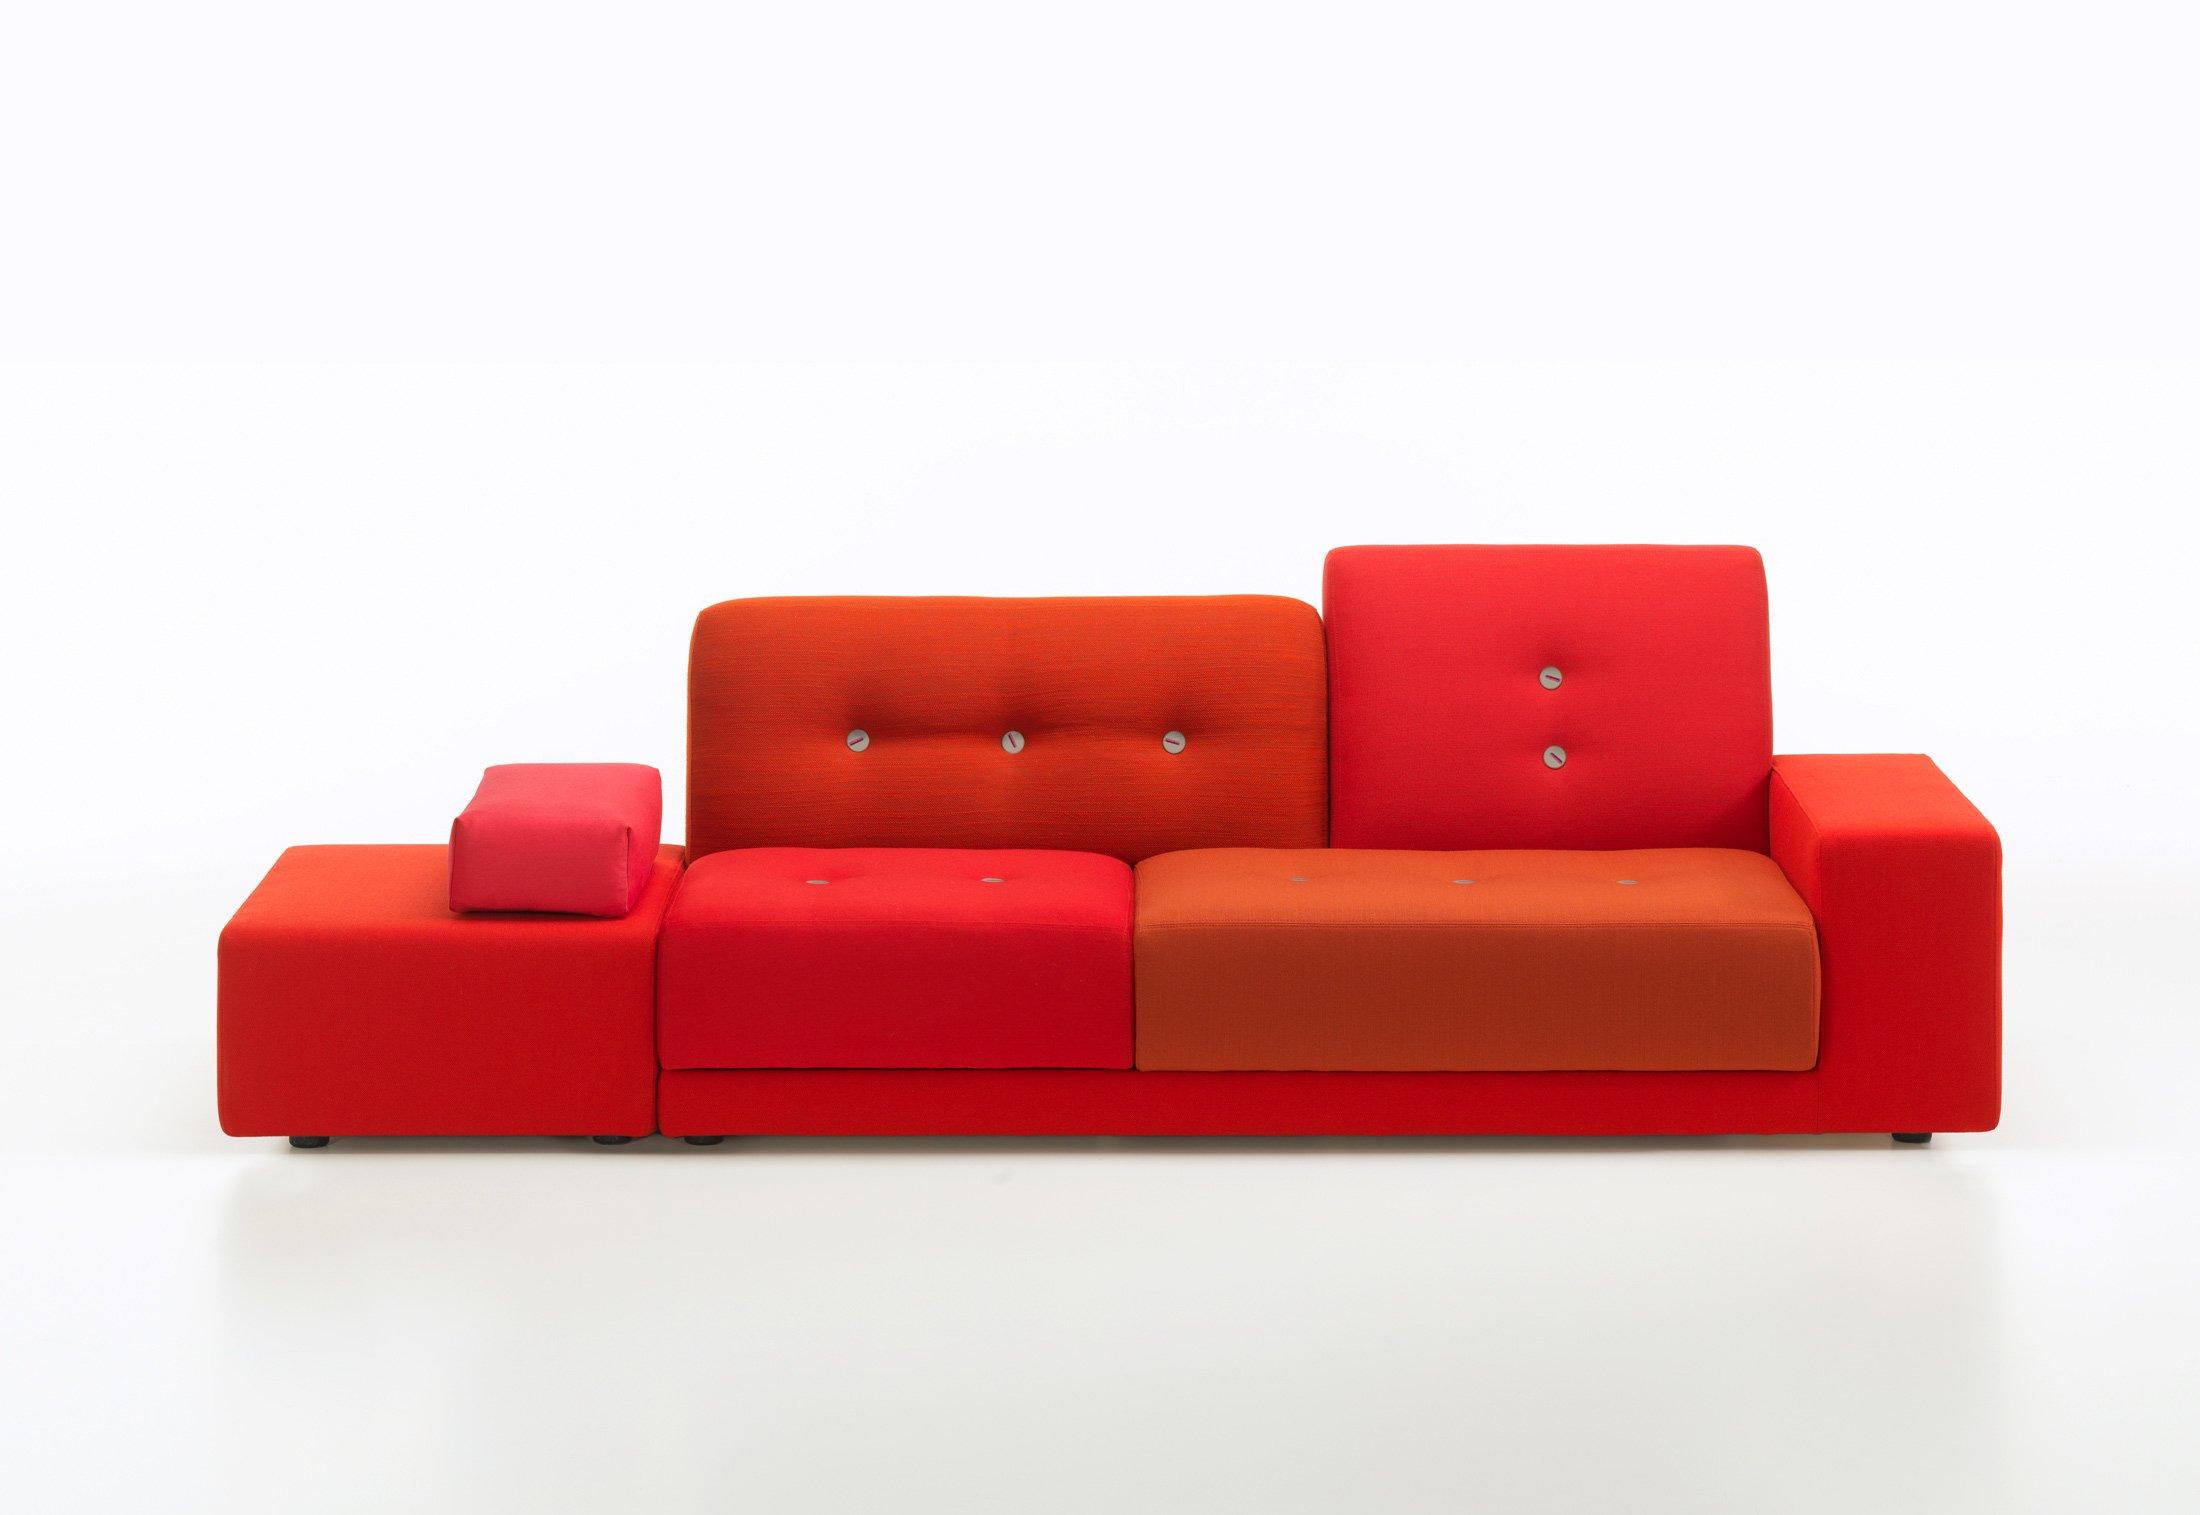 Azure Vitra Polder seating